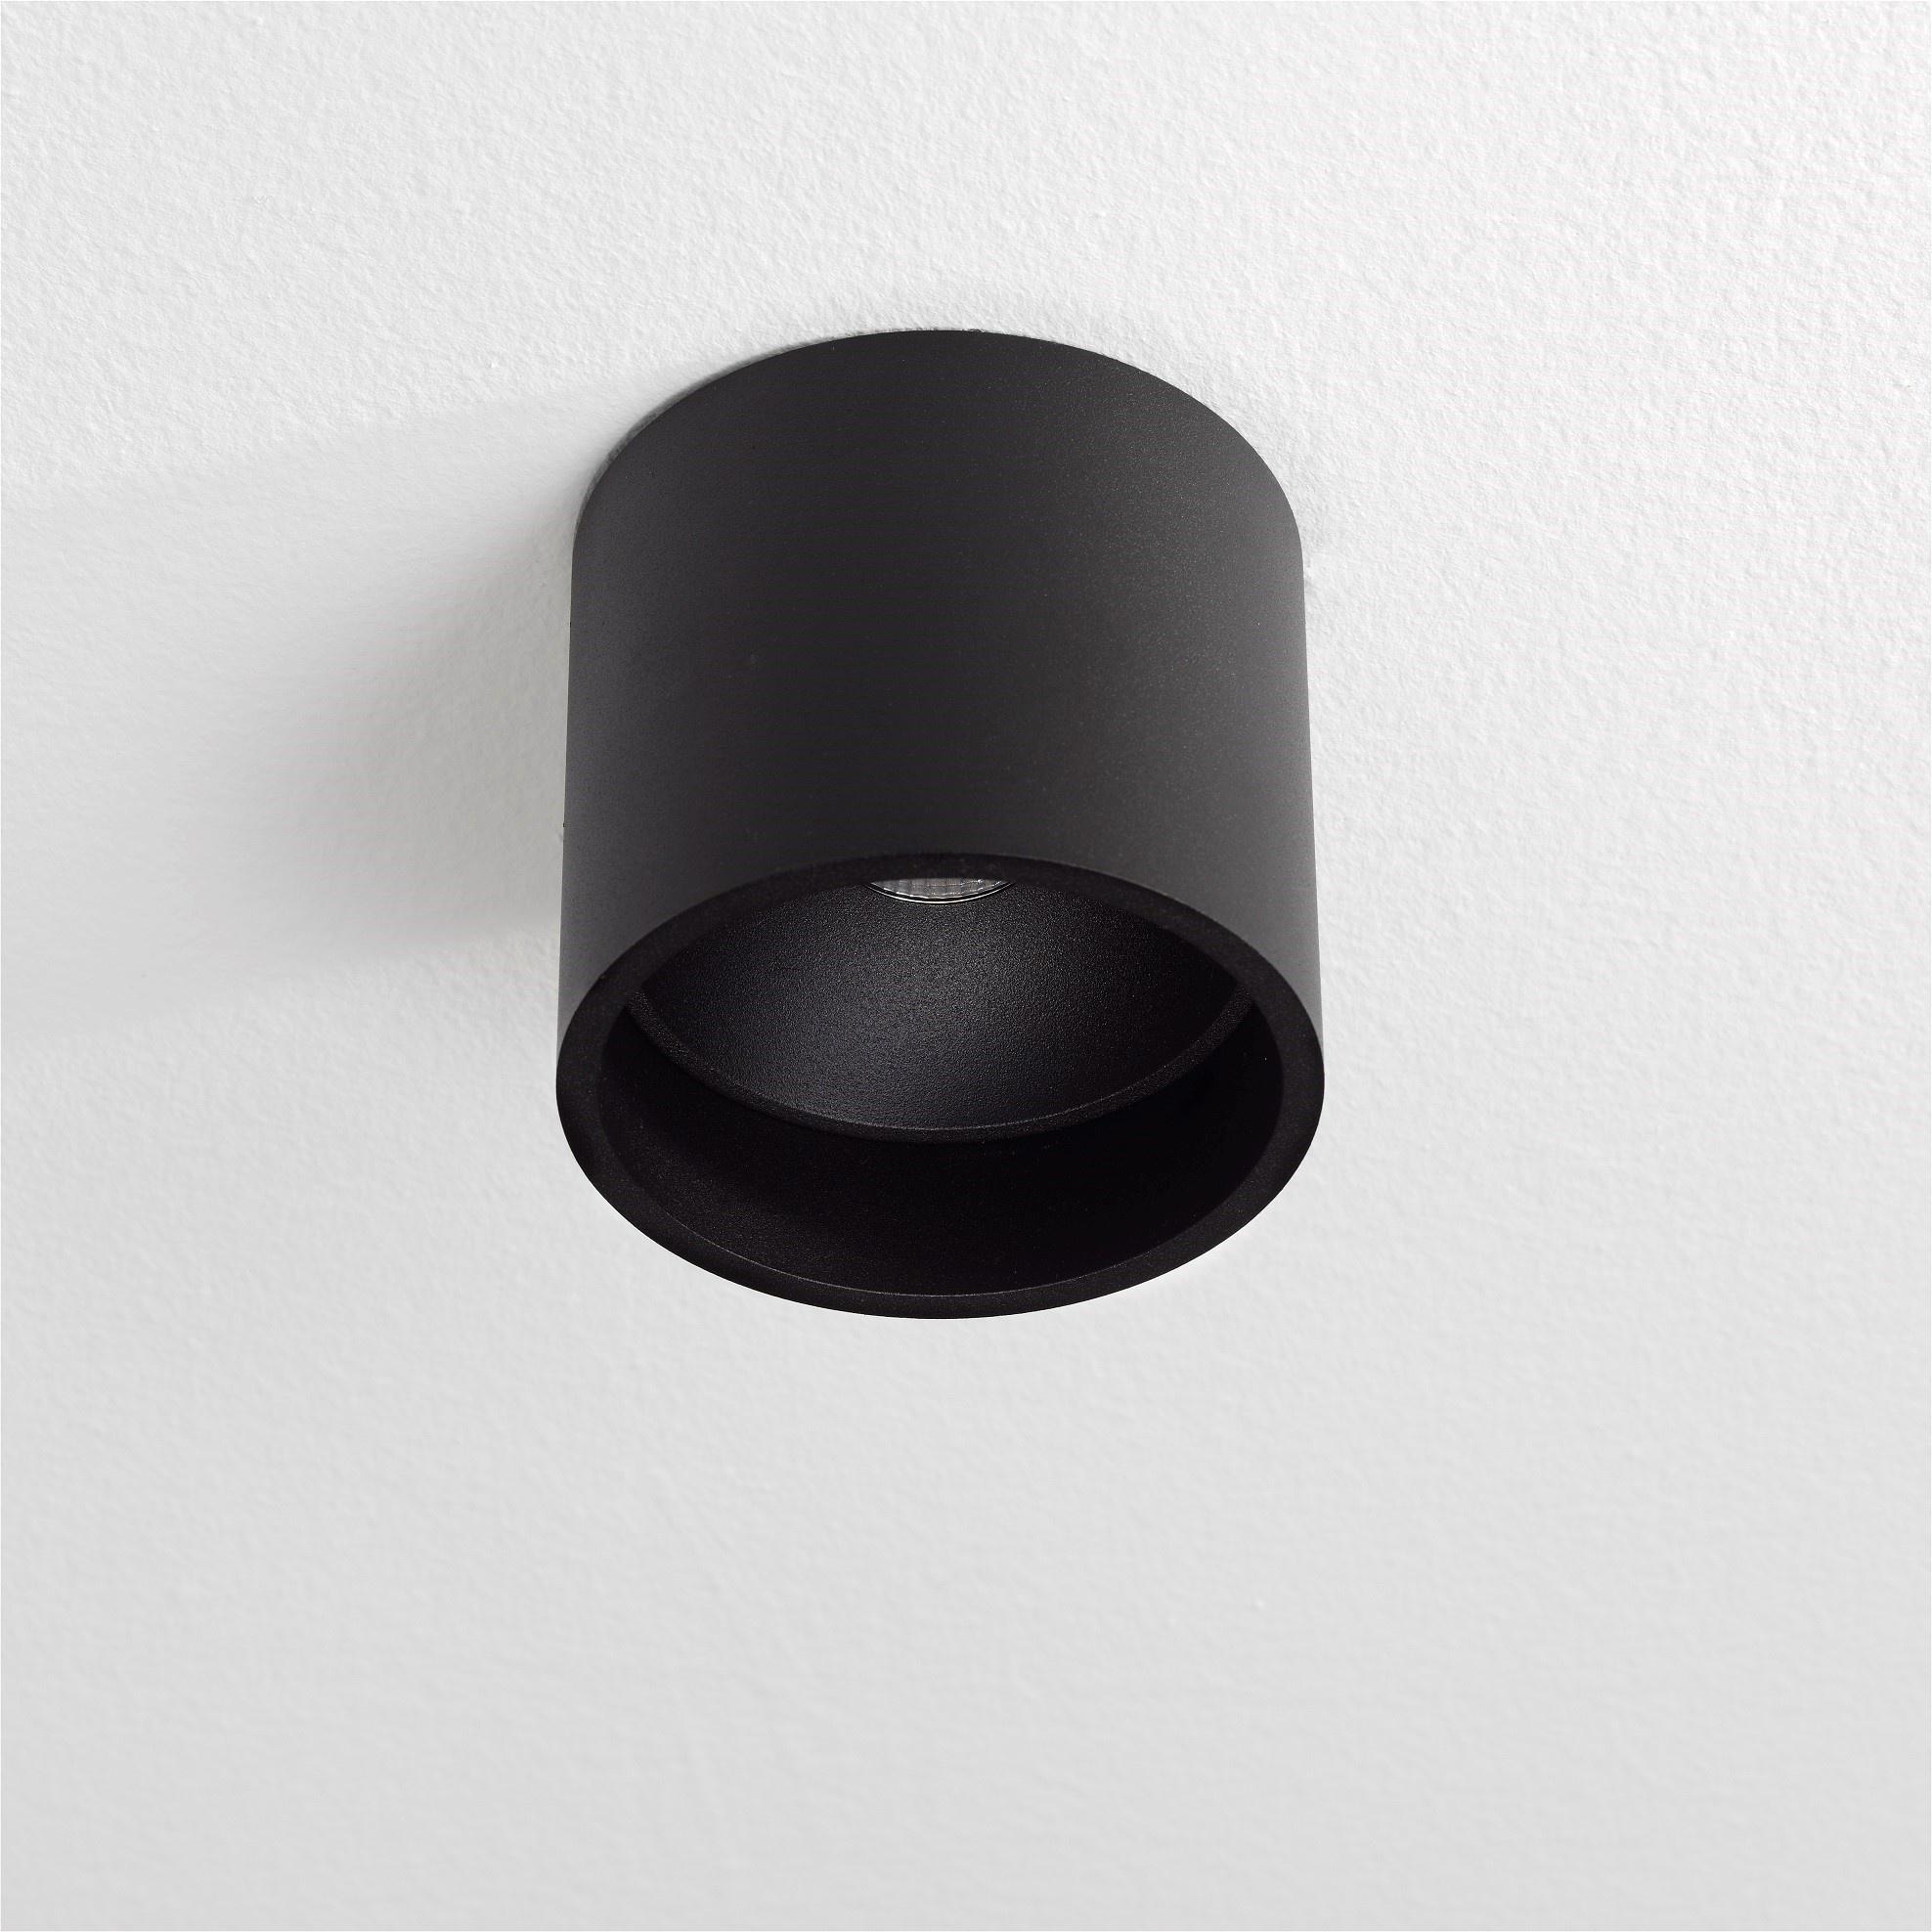 Artdelight Plafondlamp Orleans Ø 11 cm H 10 cm zwart